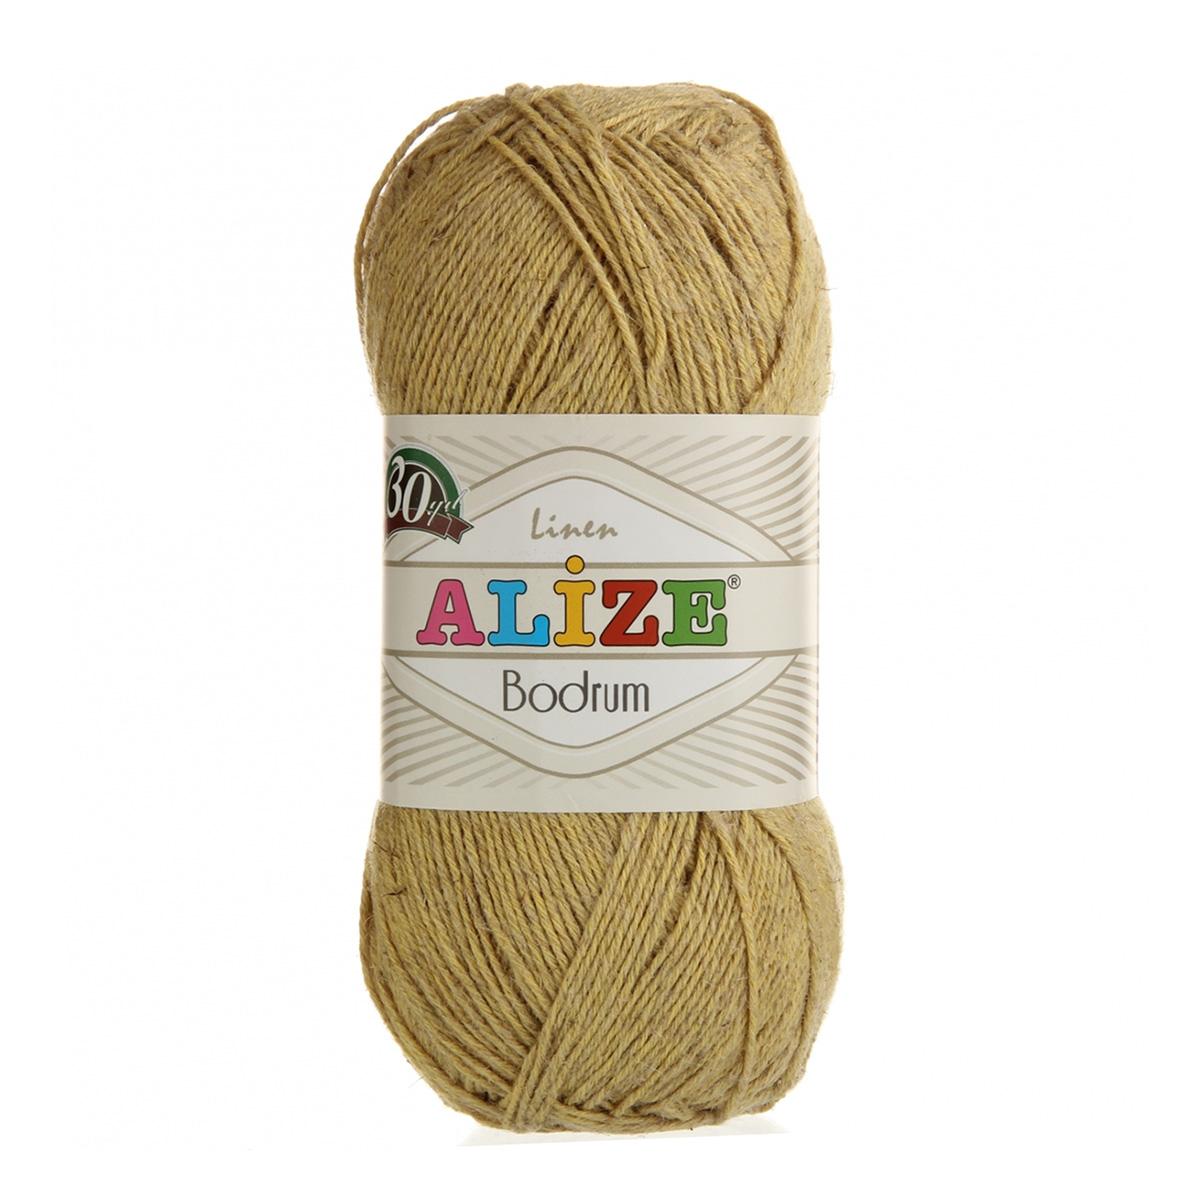 Пряжа ALIZE 'Bodrum' (48%лен,52%полиэстер)ТУ